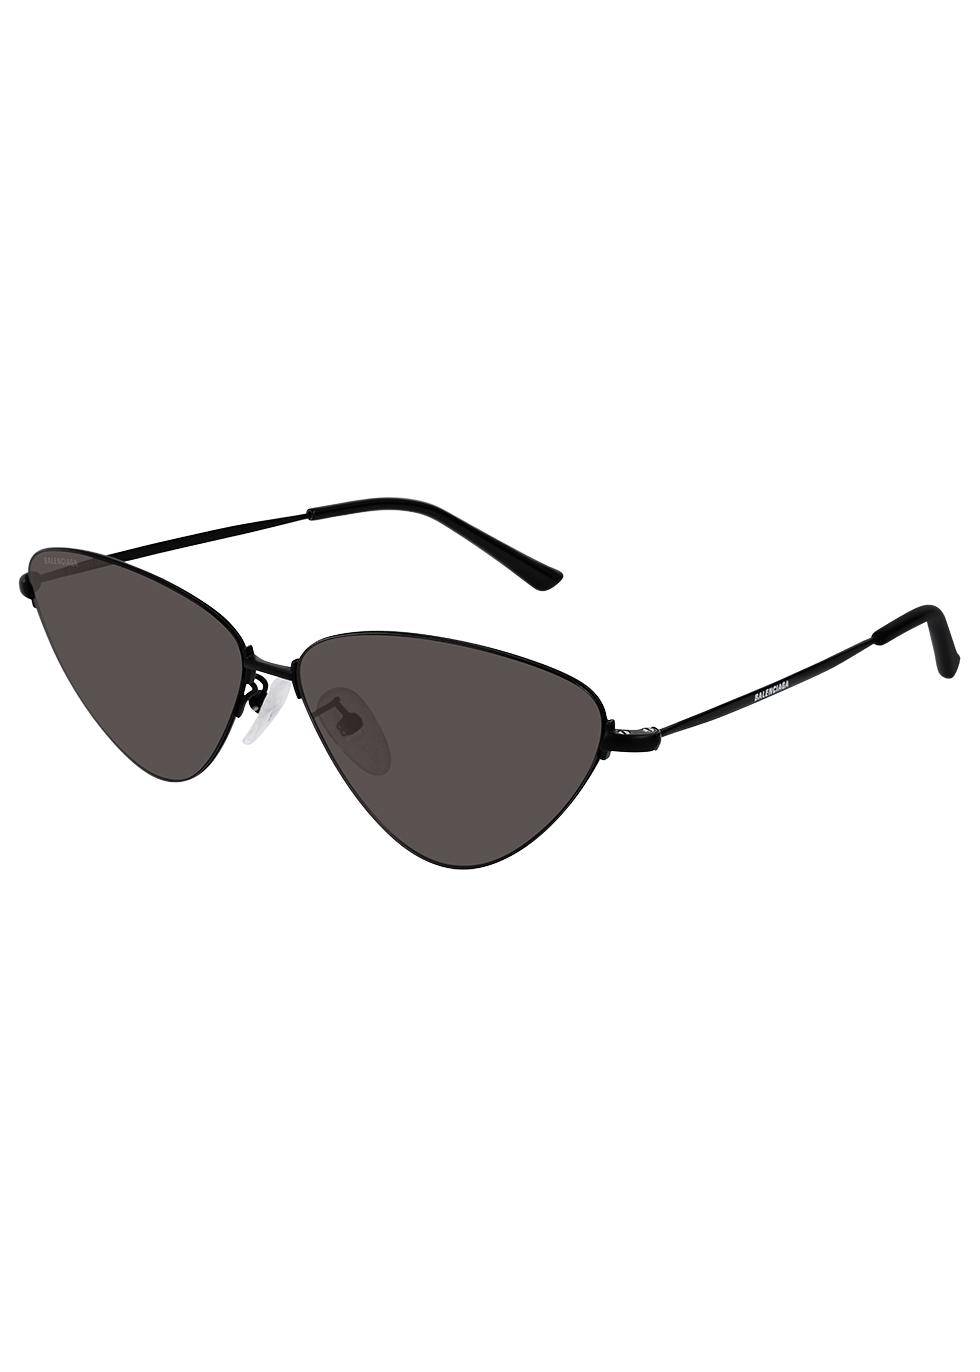 6cbab32fe70 Men s Designer Sunglasses   Eyewear - Harvey Nichols